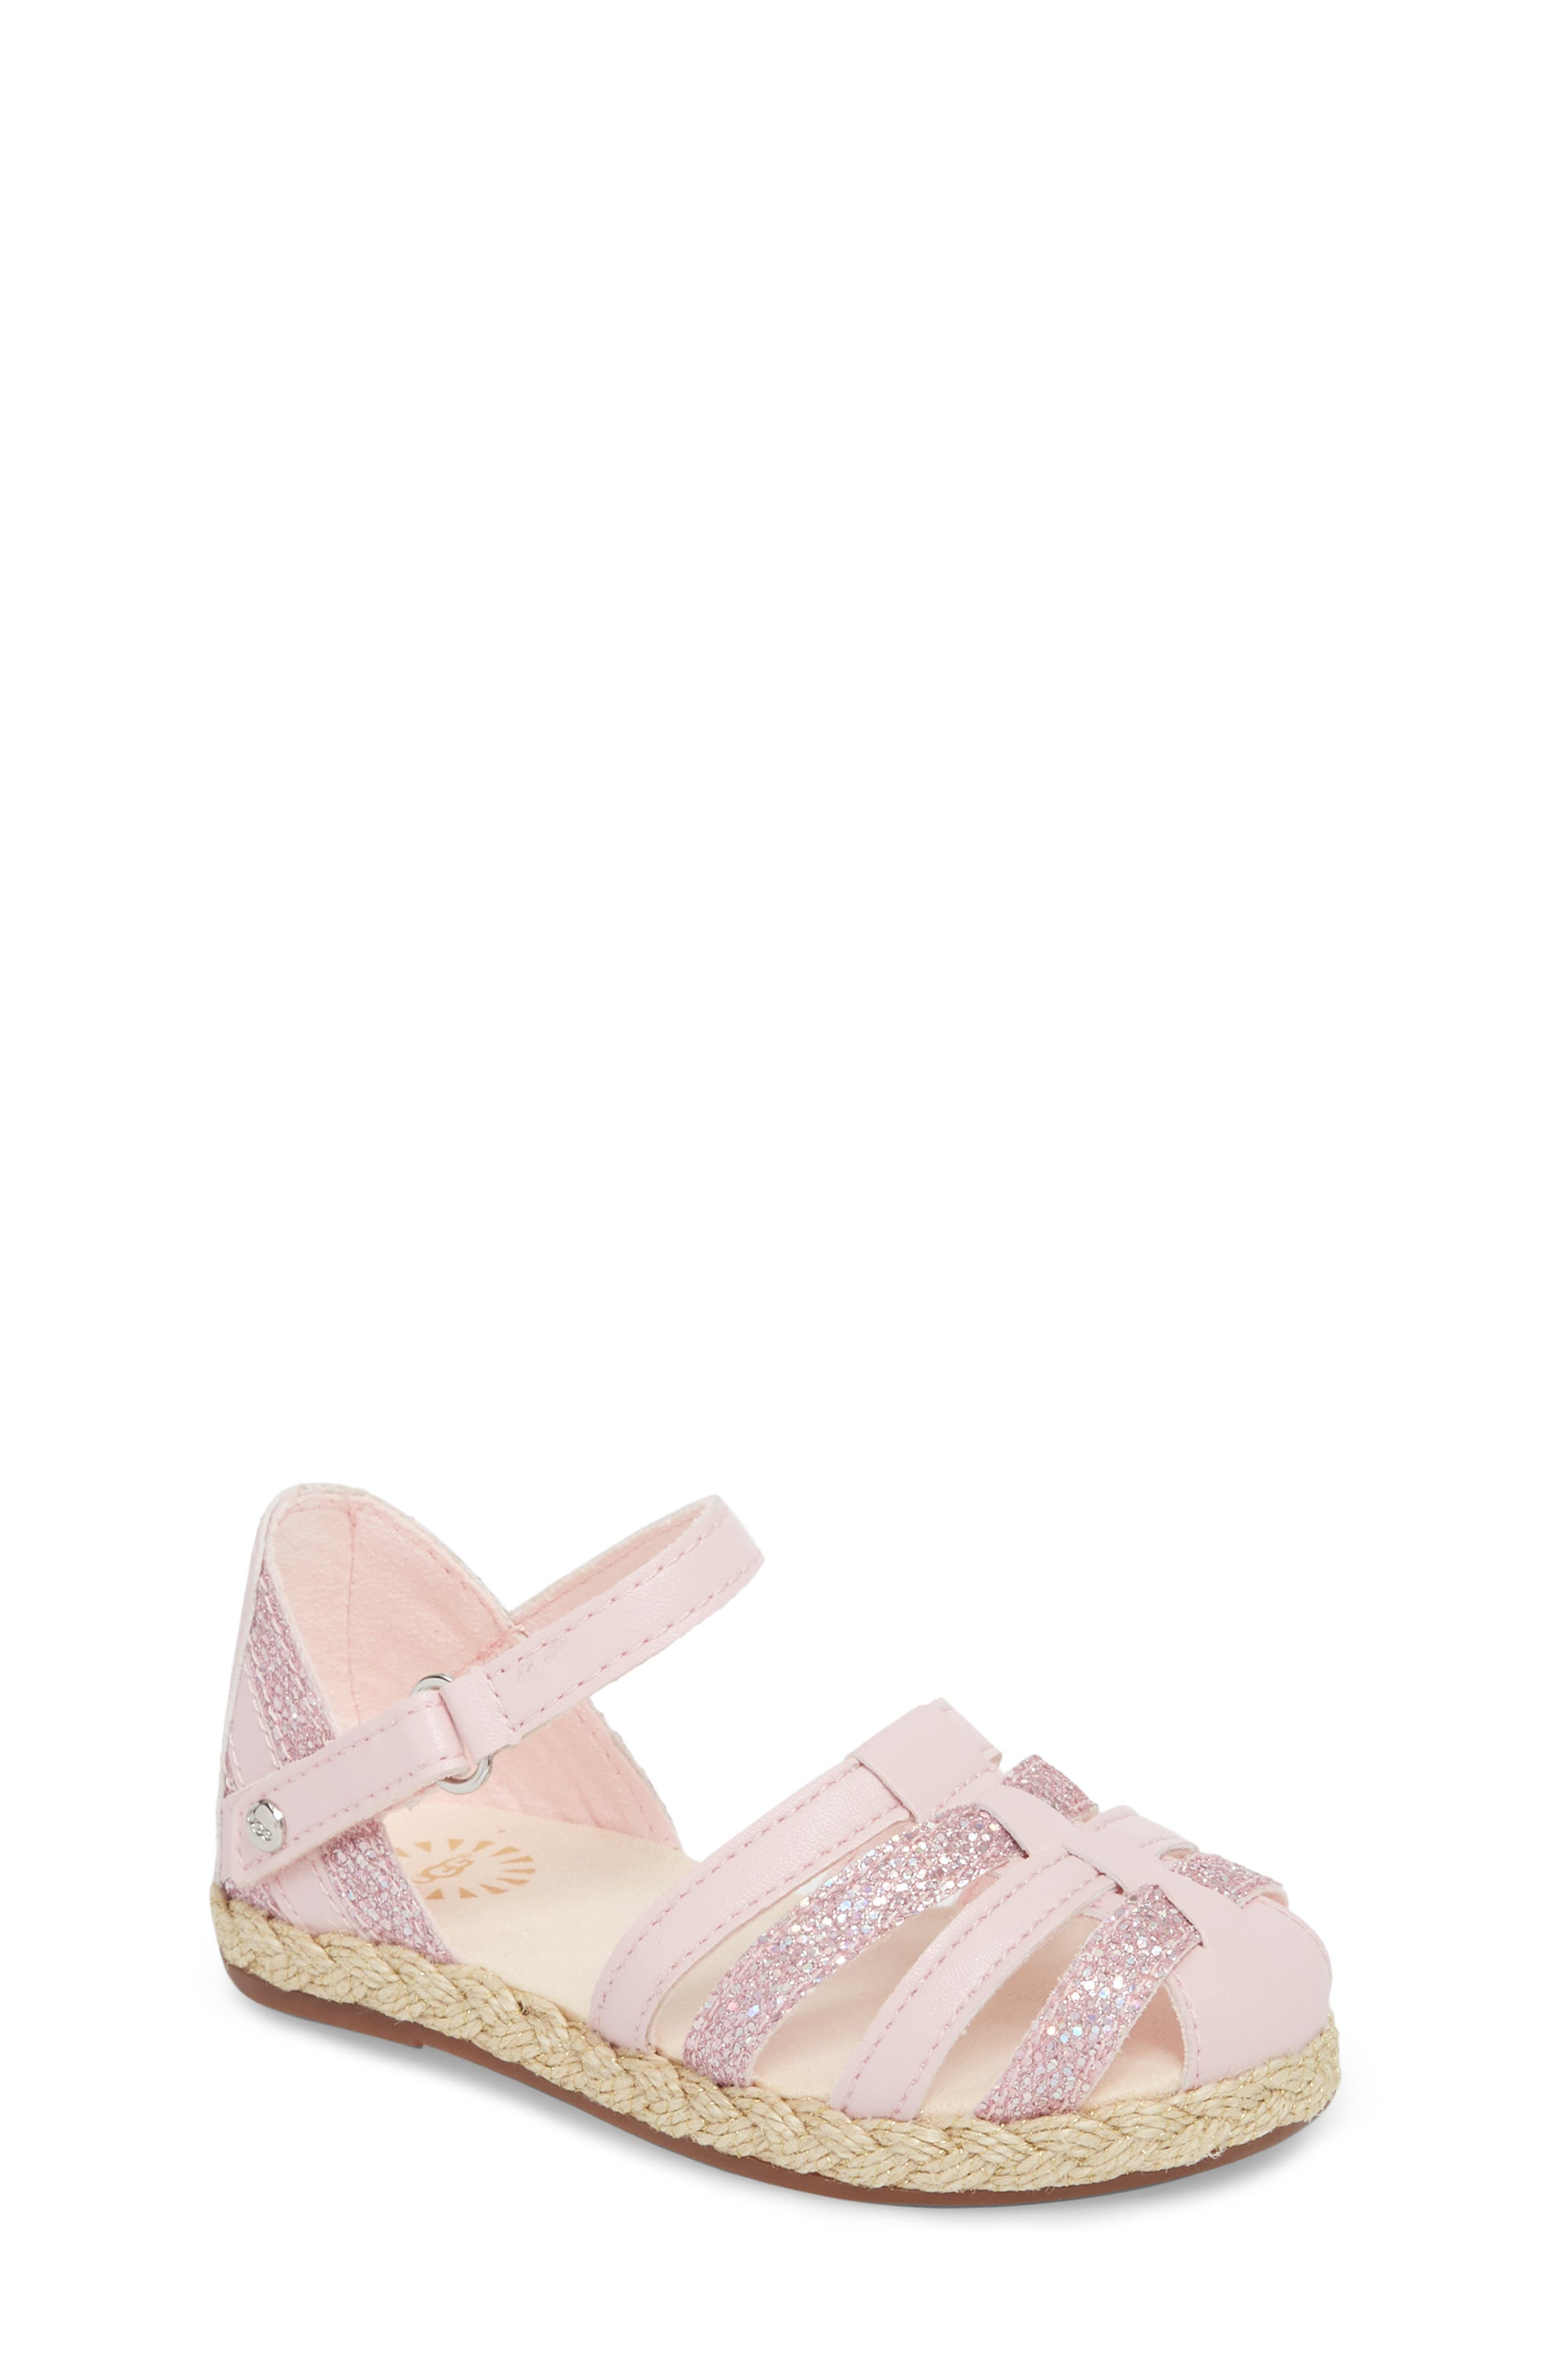 Matilde Espadrille Sandal,                         Main,                         color, Seashell Pink